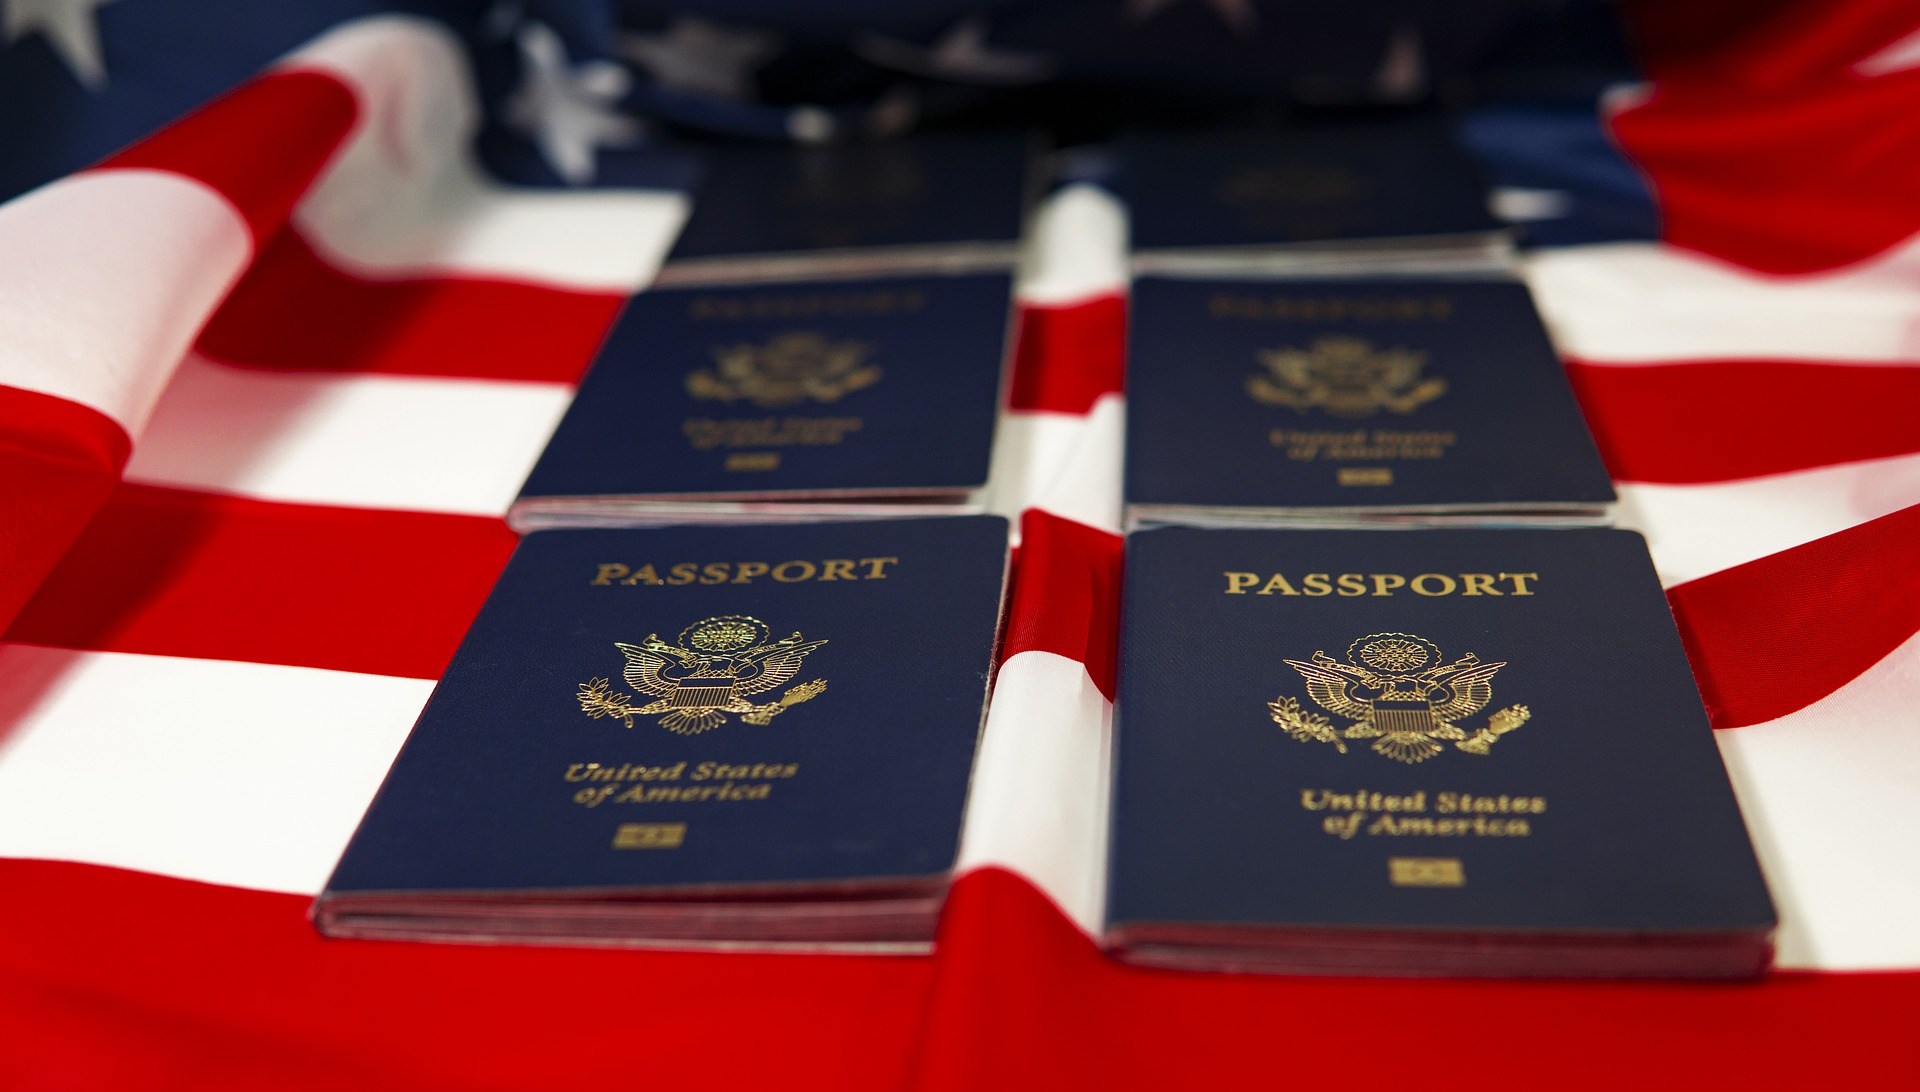 passports on american flag